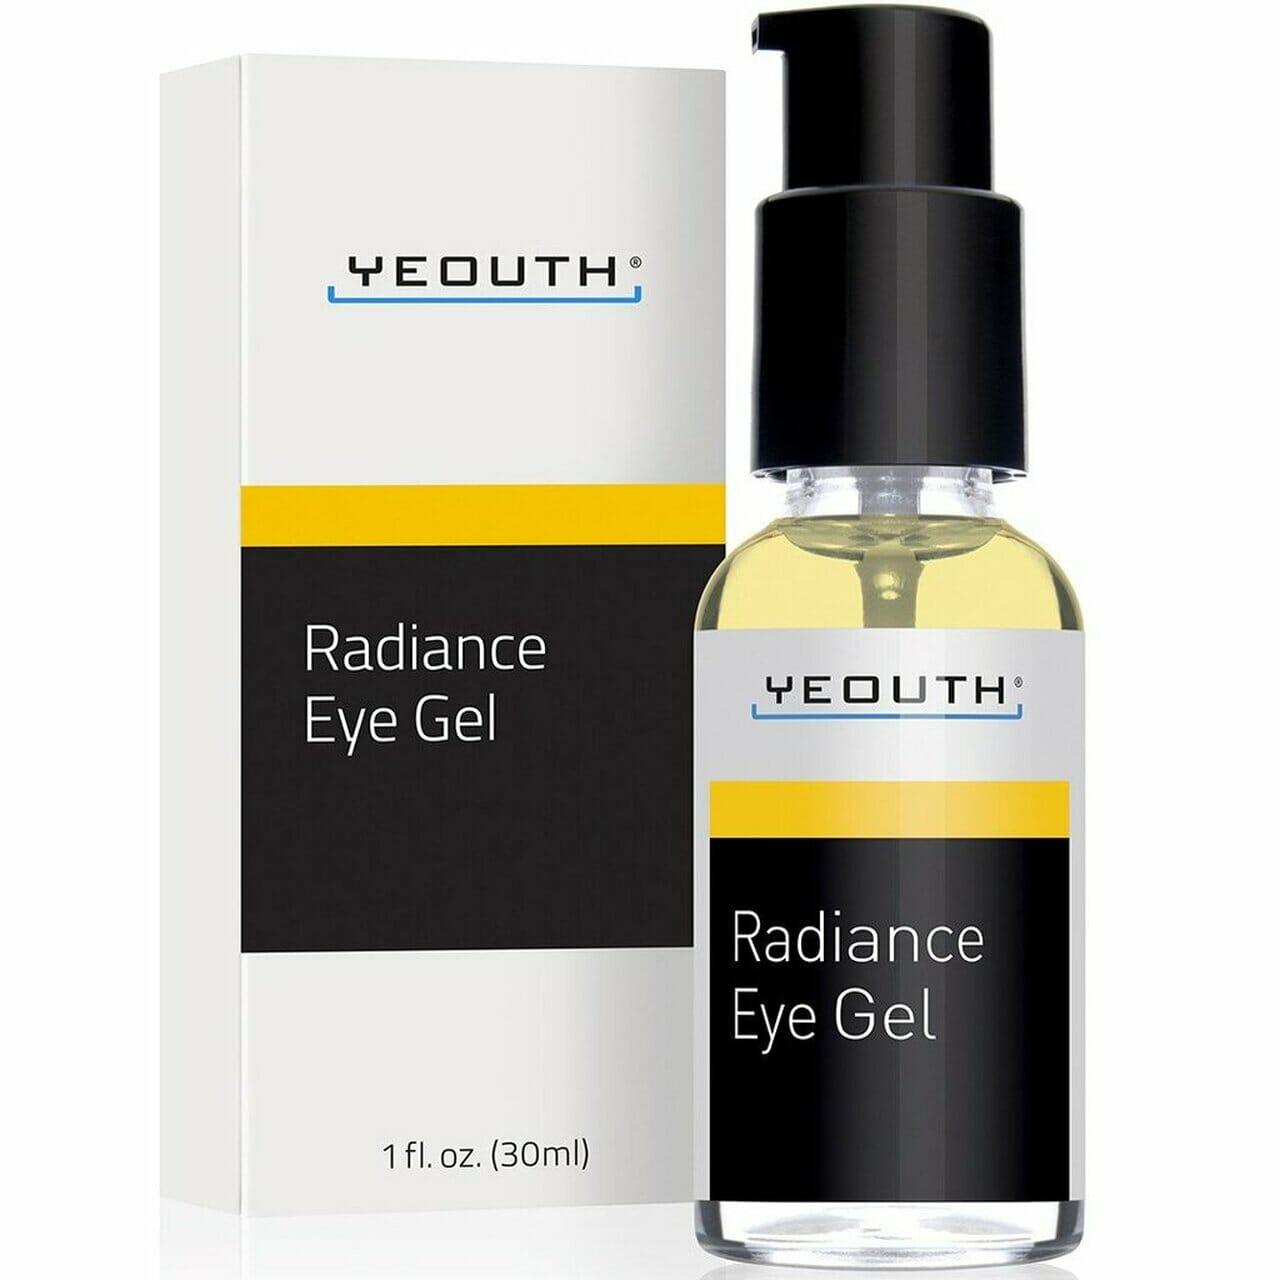 Radiance Eye Gel With Hyaluronic Acid and Tripeptide Best Eye Cream in Pakistan